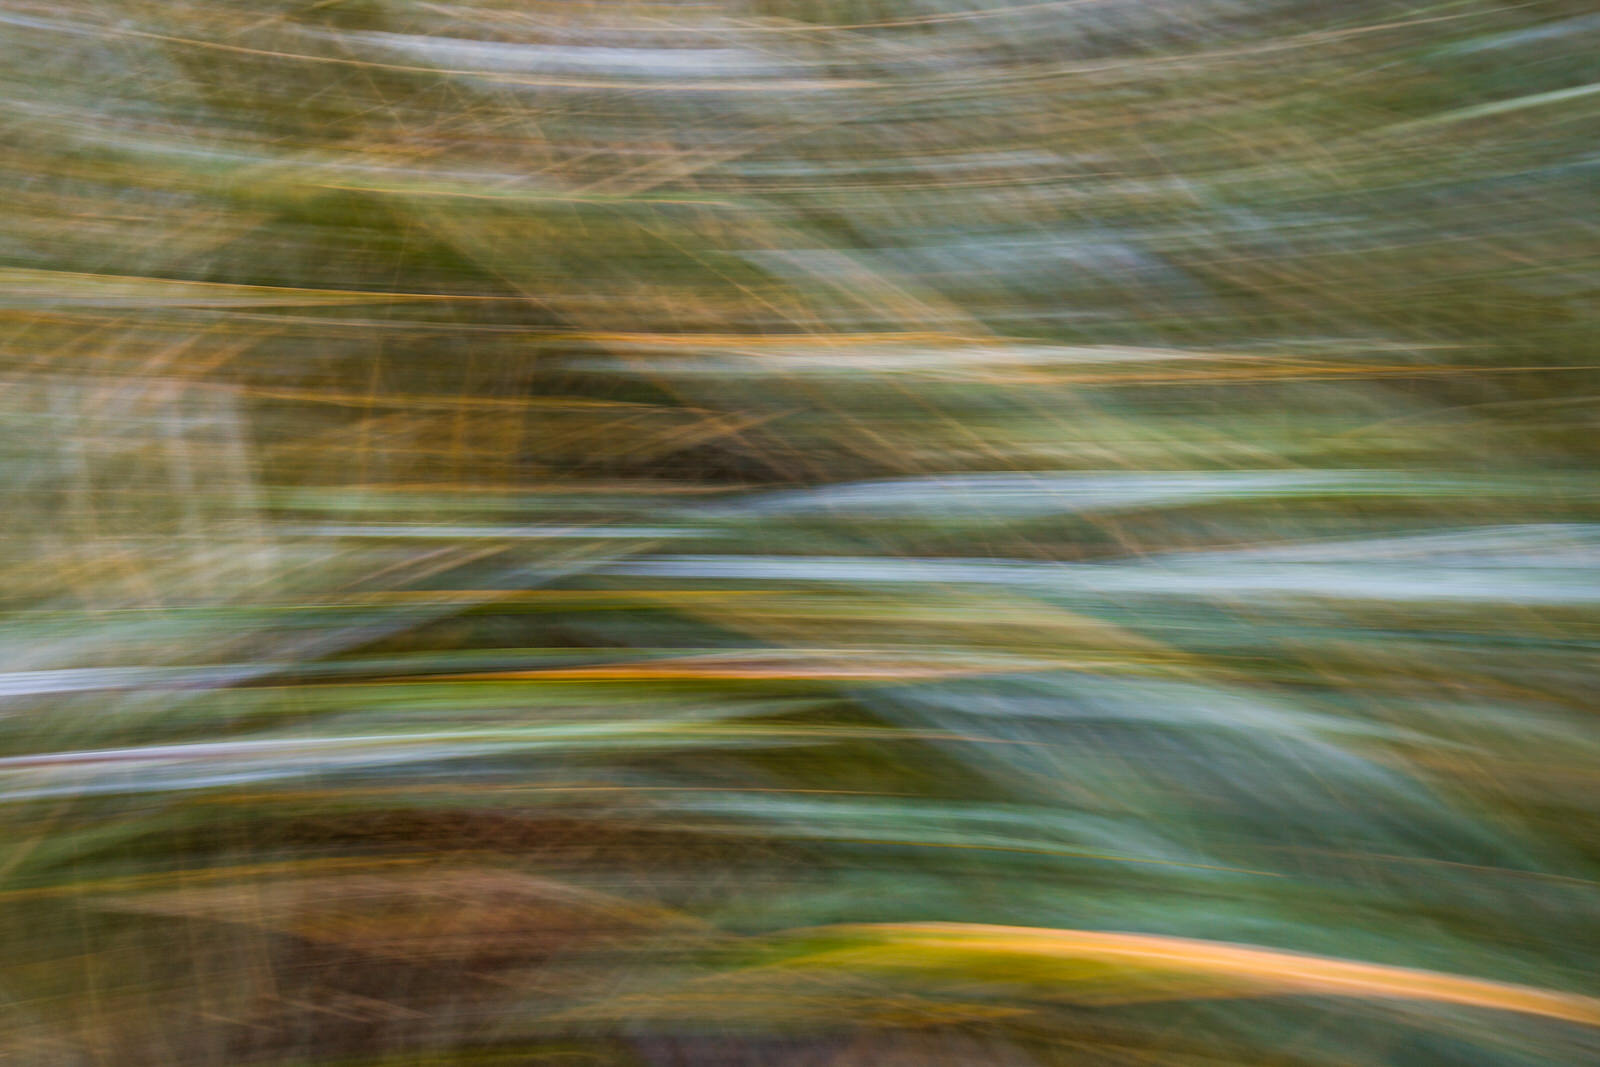 Rialto dune grass motion blur